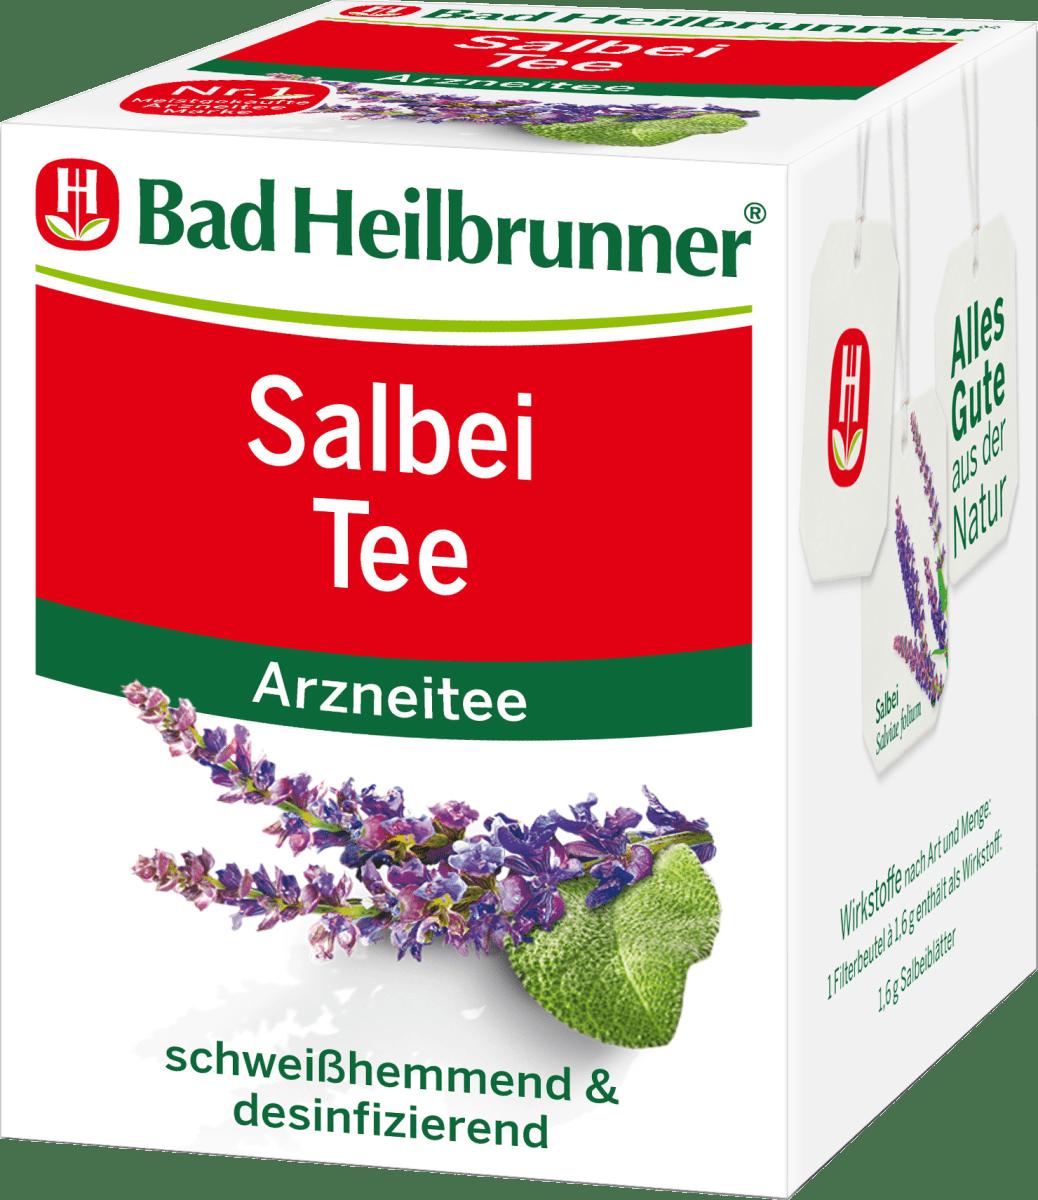 Bad Heilbrunner Arznei-Tee, Salbei (8 x 1,6 g), 12,8 g